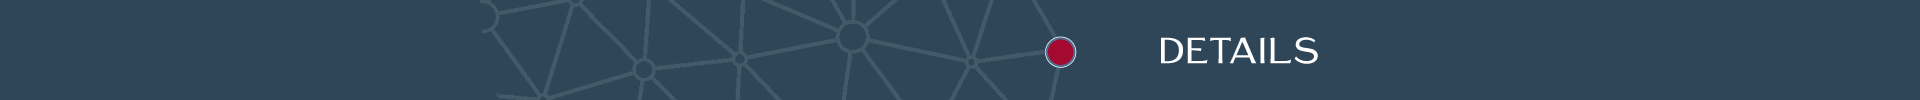 Slider_Details-new